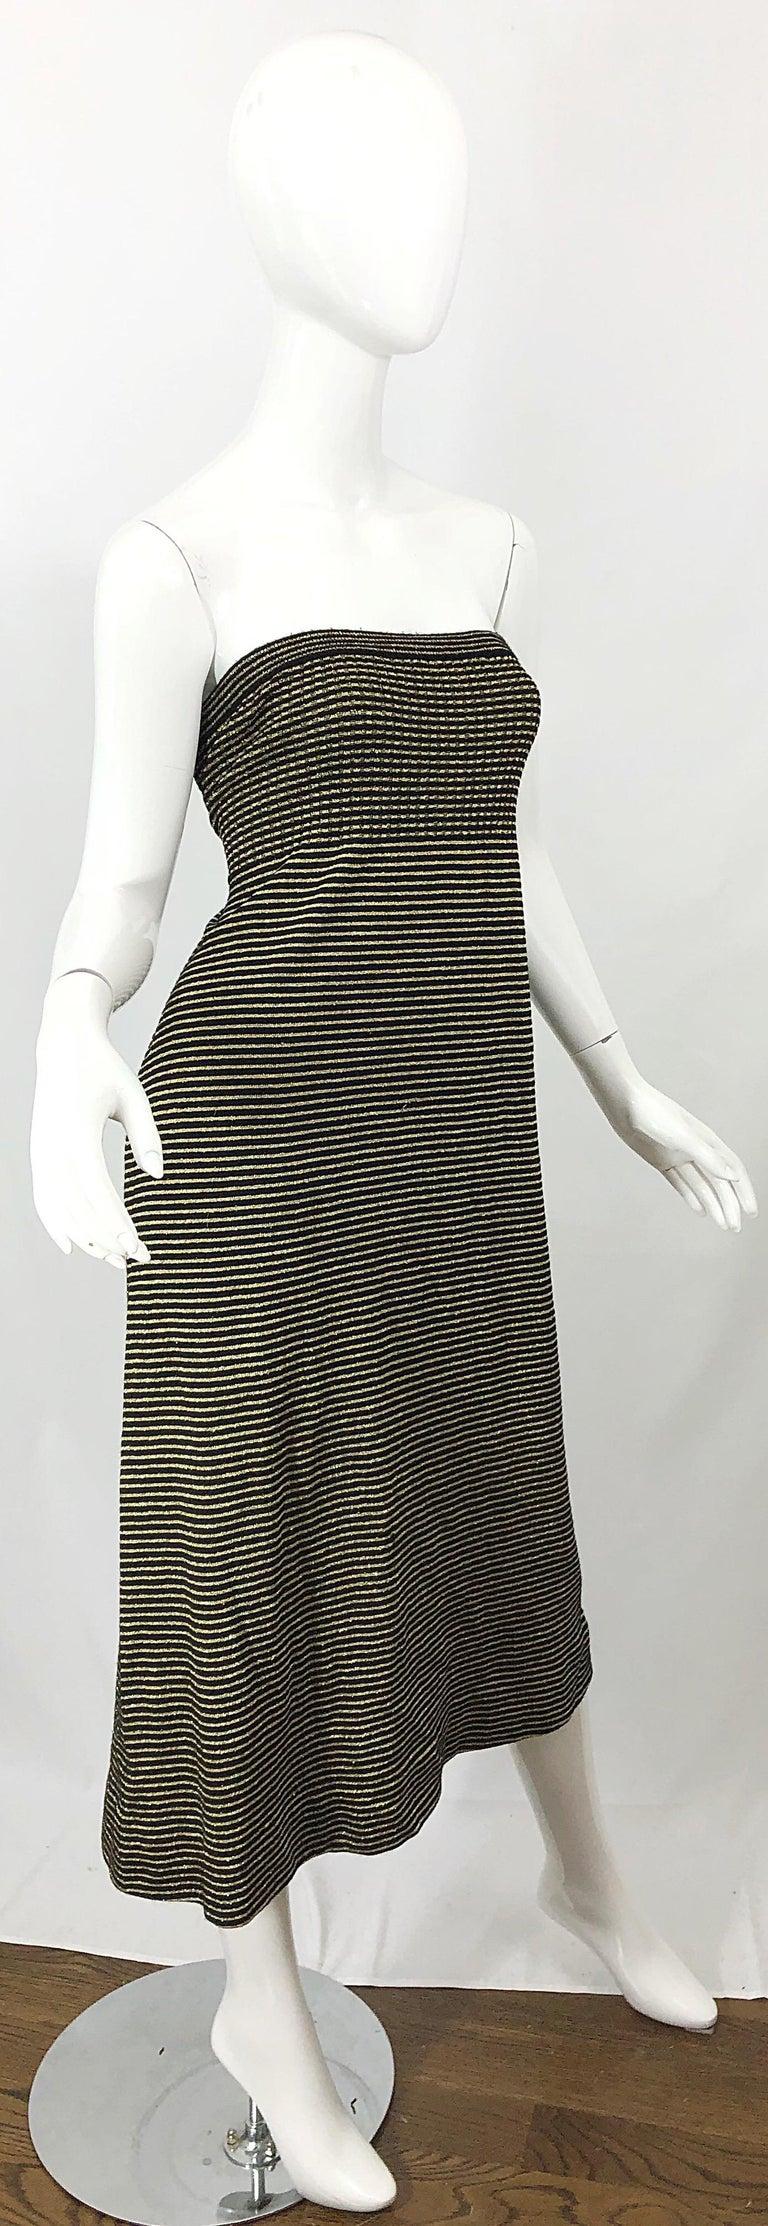 Vintage Yves Saint Laurent YSL 70s Gold Black Strapless Knit Dress or Maxi Skirt For Sale 7